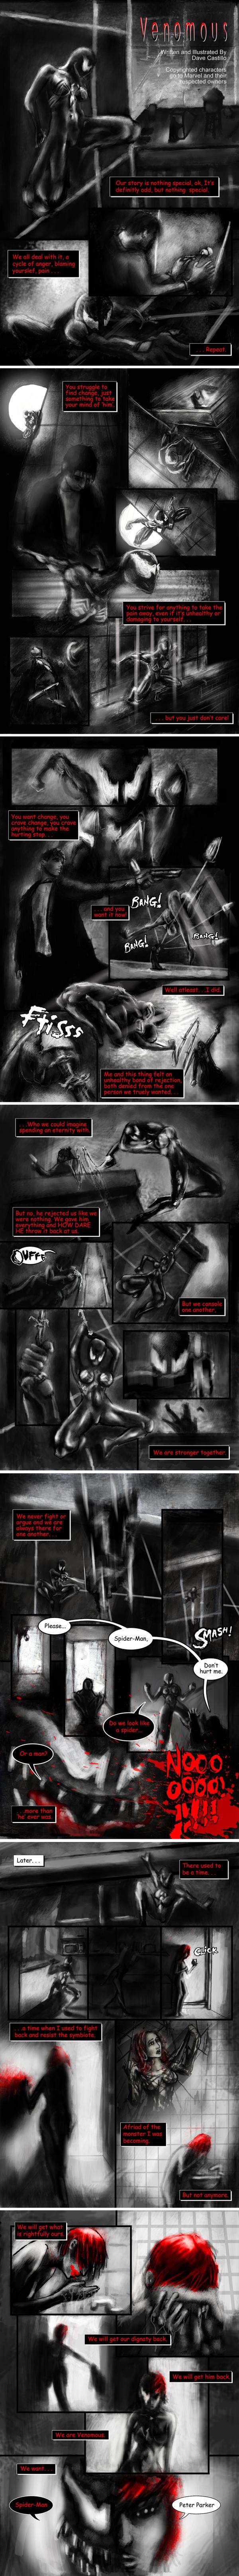 Venomous (She-Venom Fan Fiction) by purplecastillo